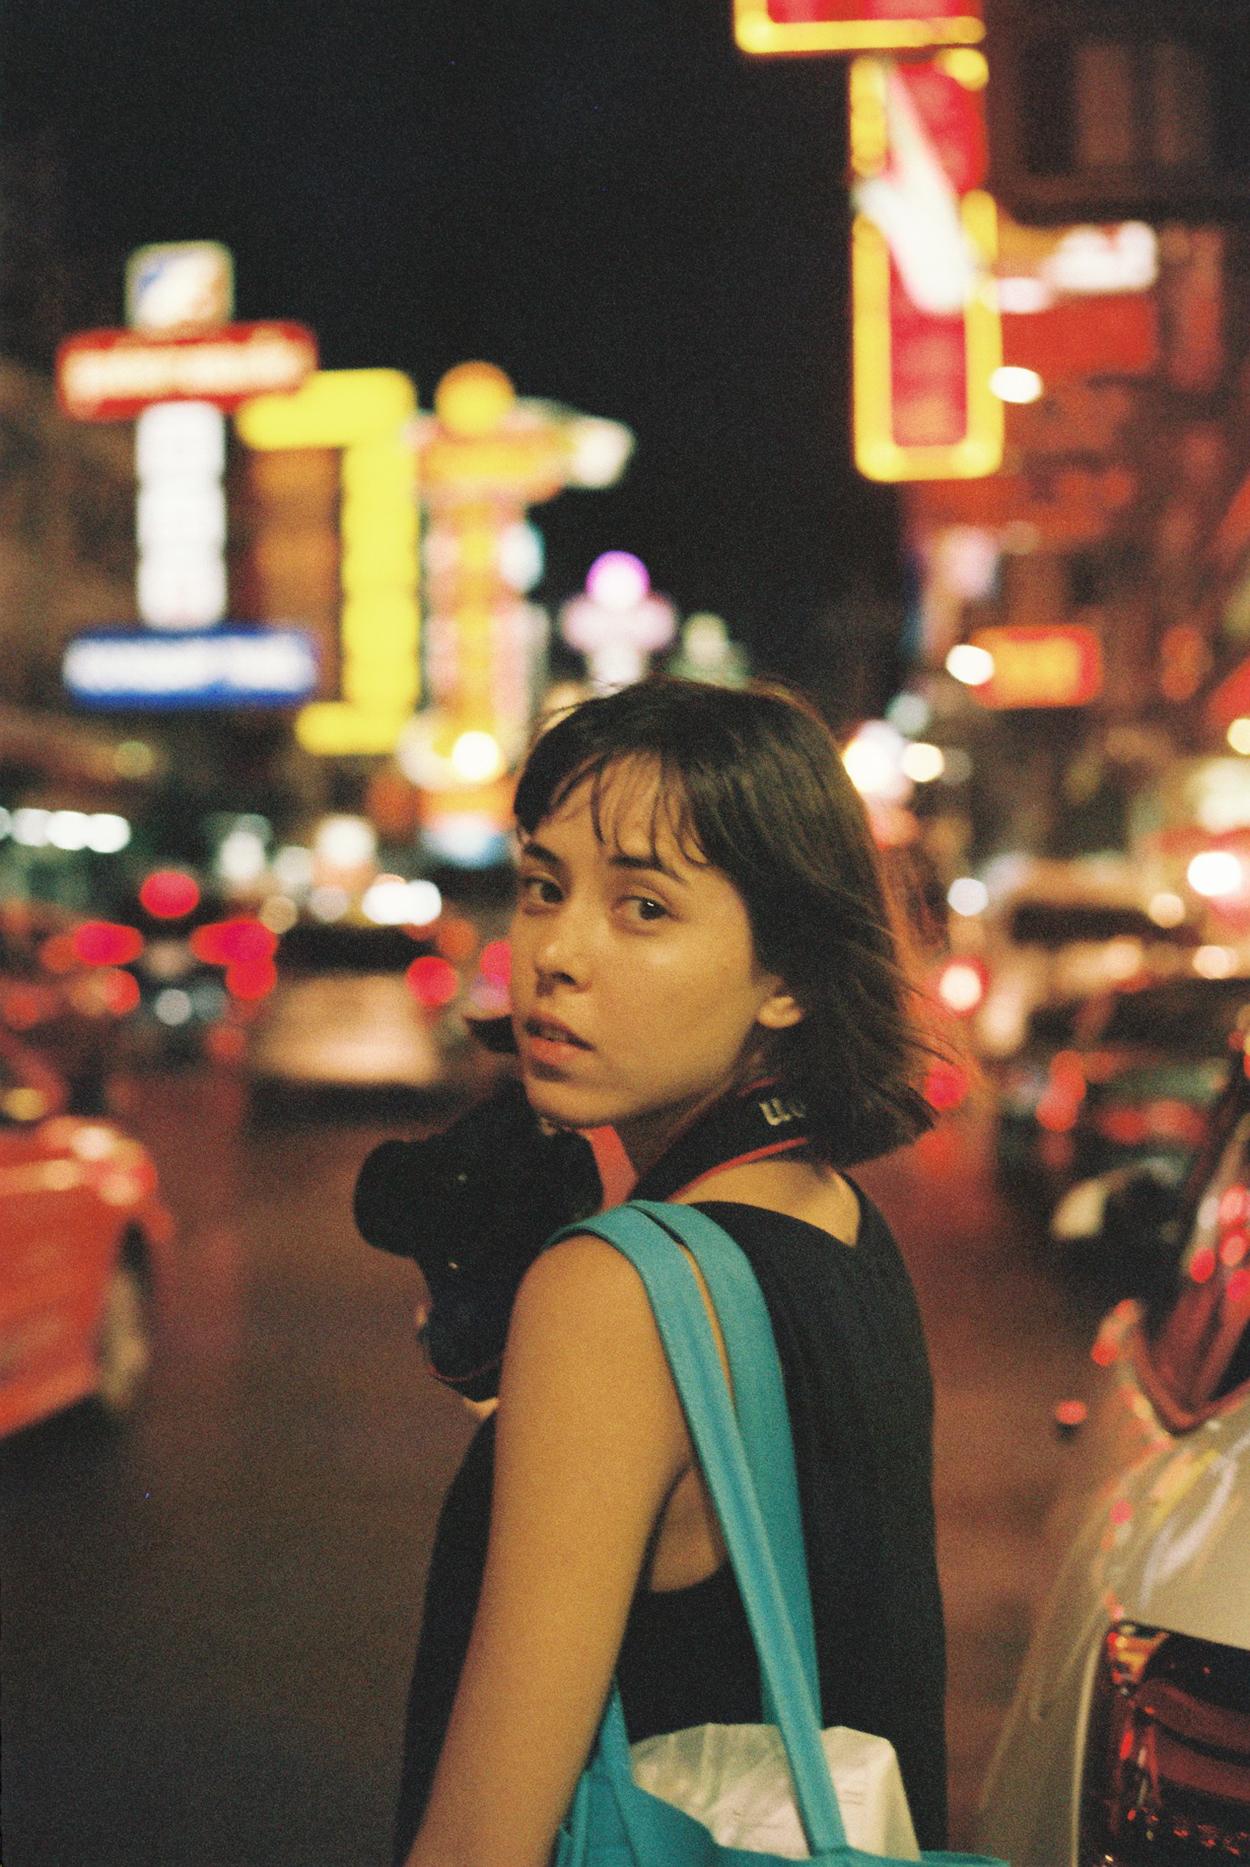 Mulheres que fotografam: Takeuchiss